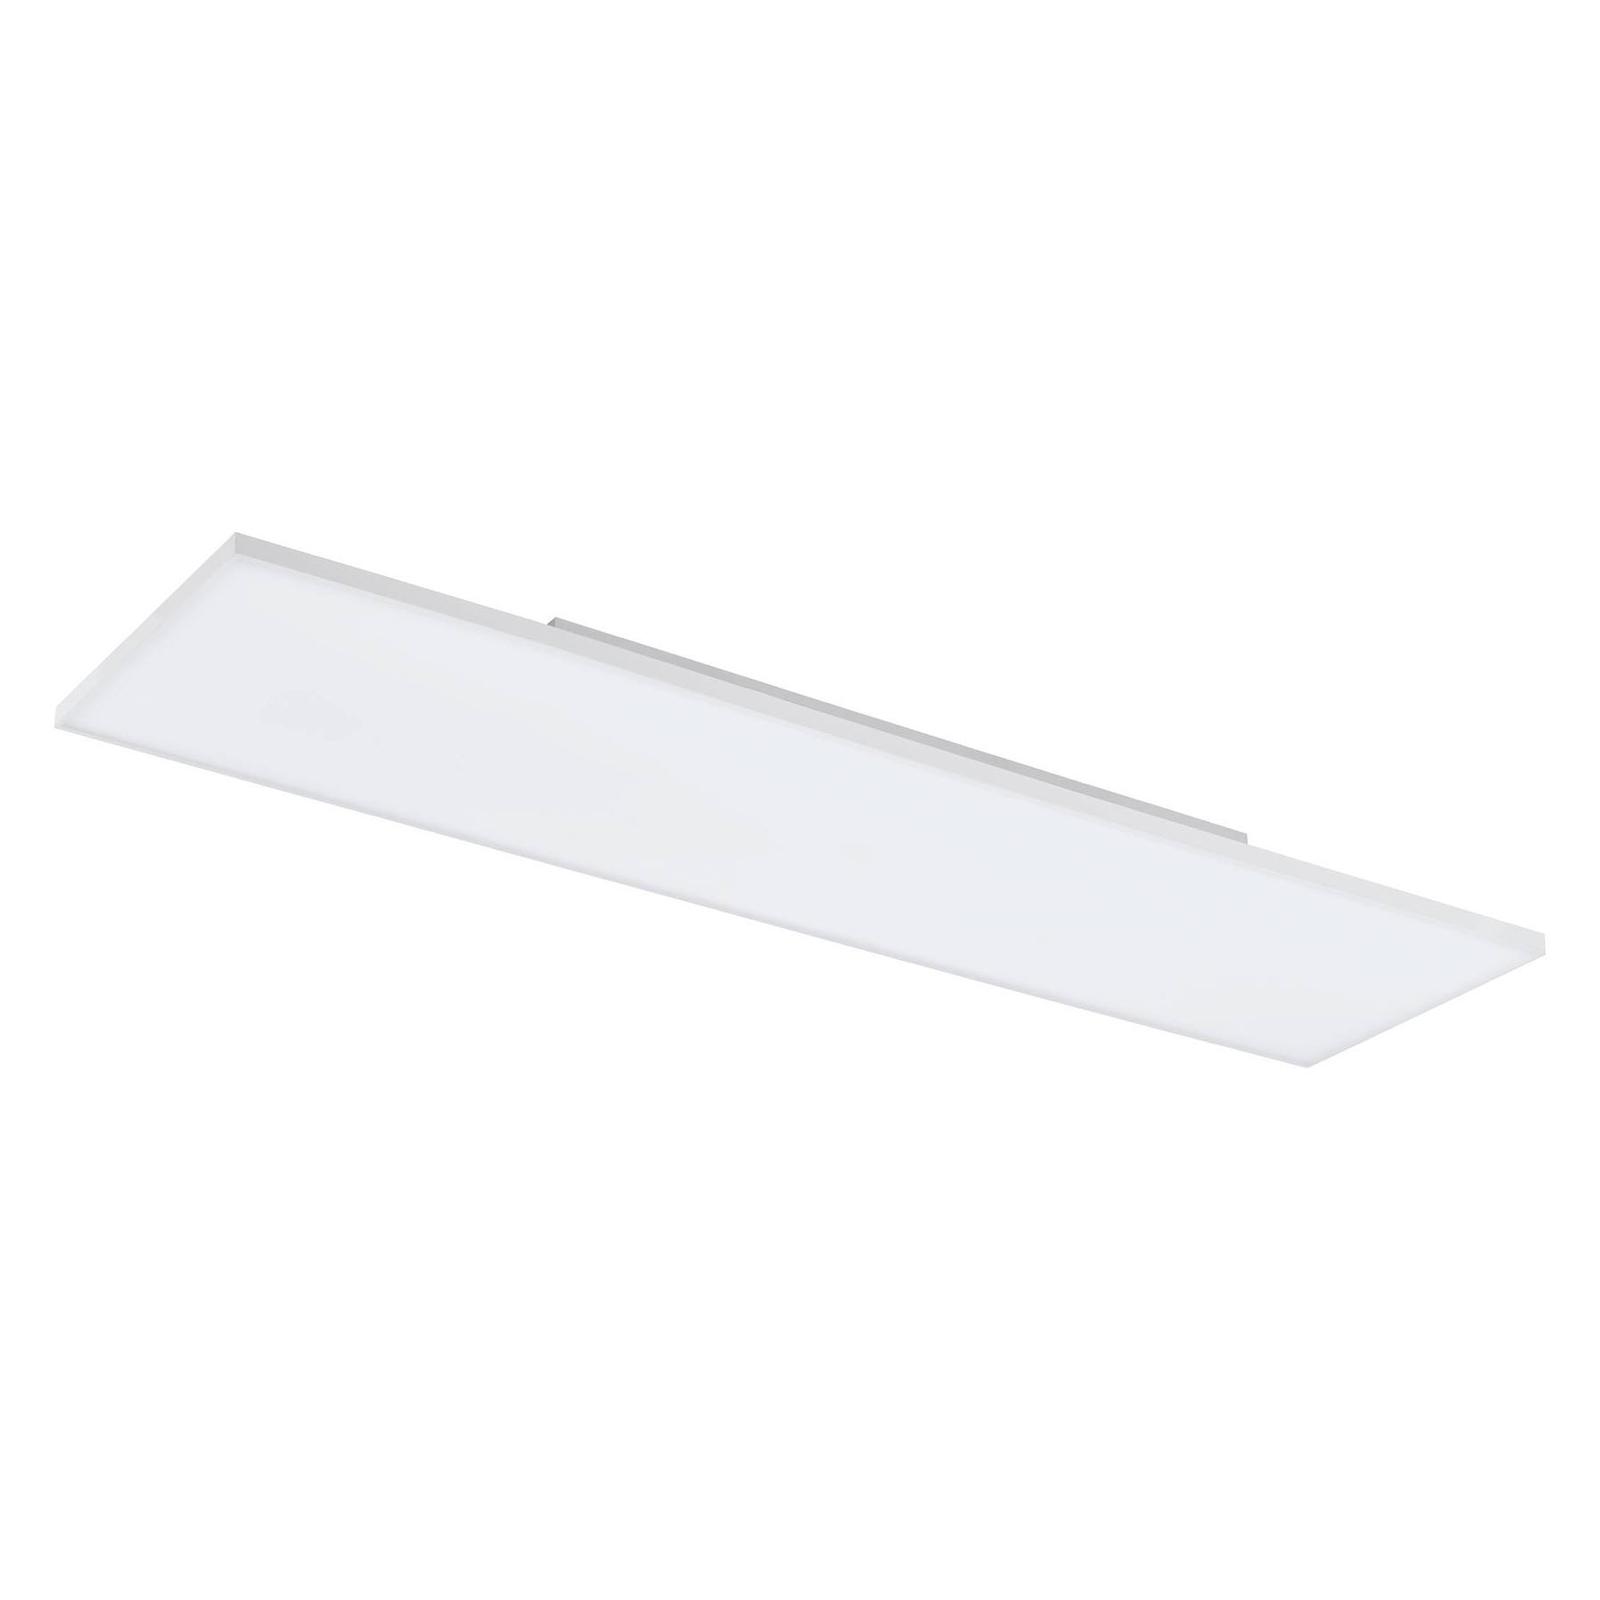 EGLO connect Turcona-C LED-taklampa 120 x 30 cm